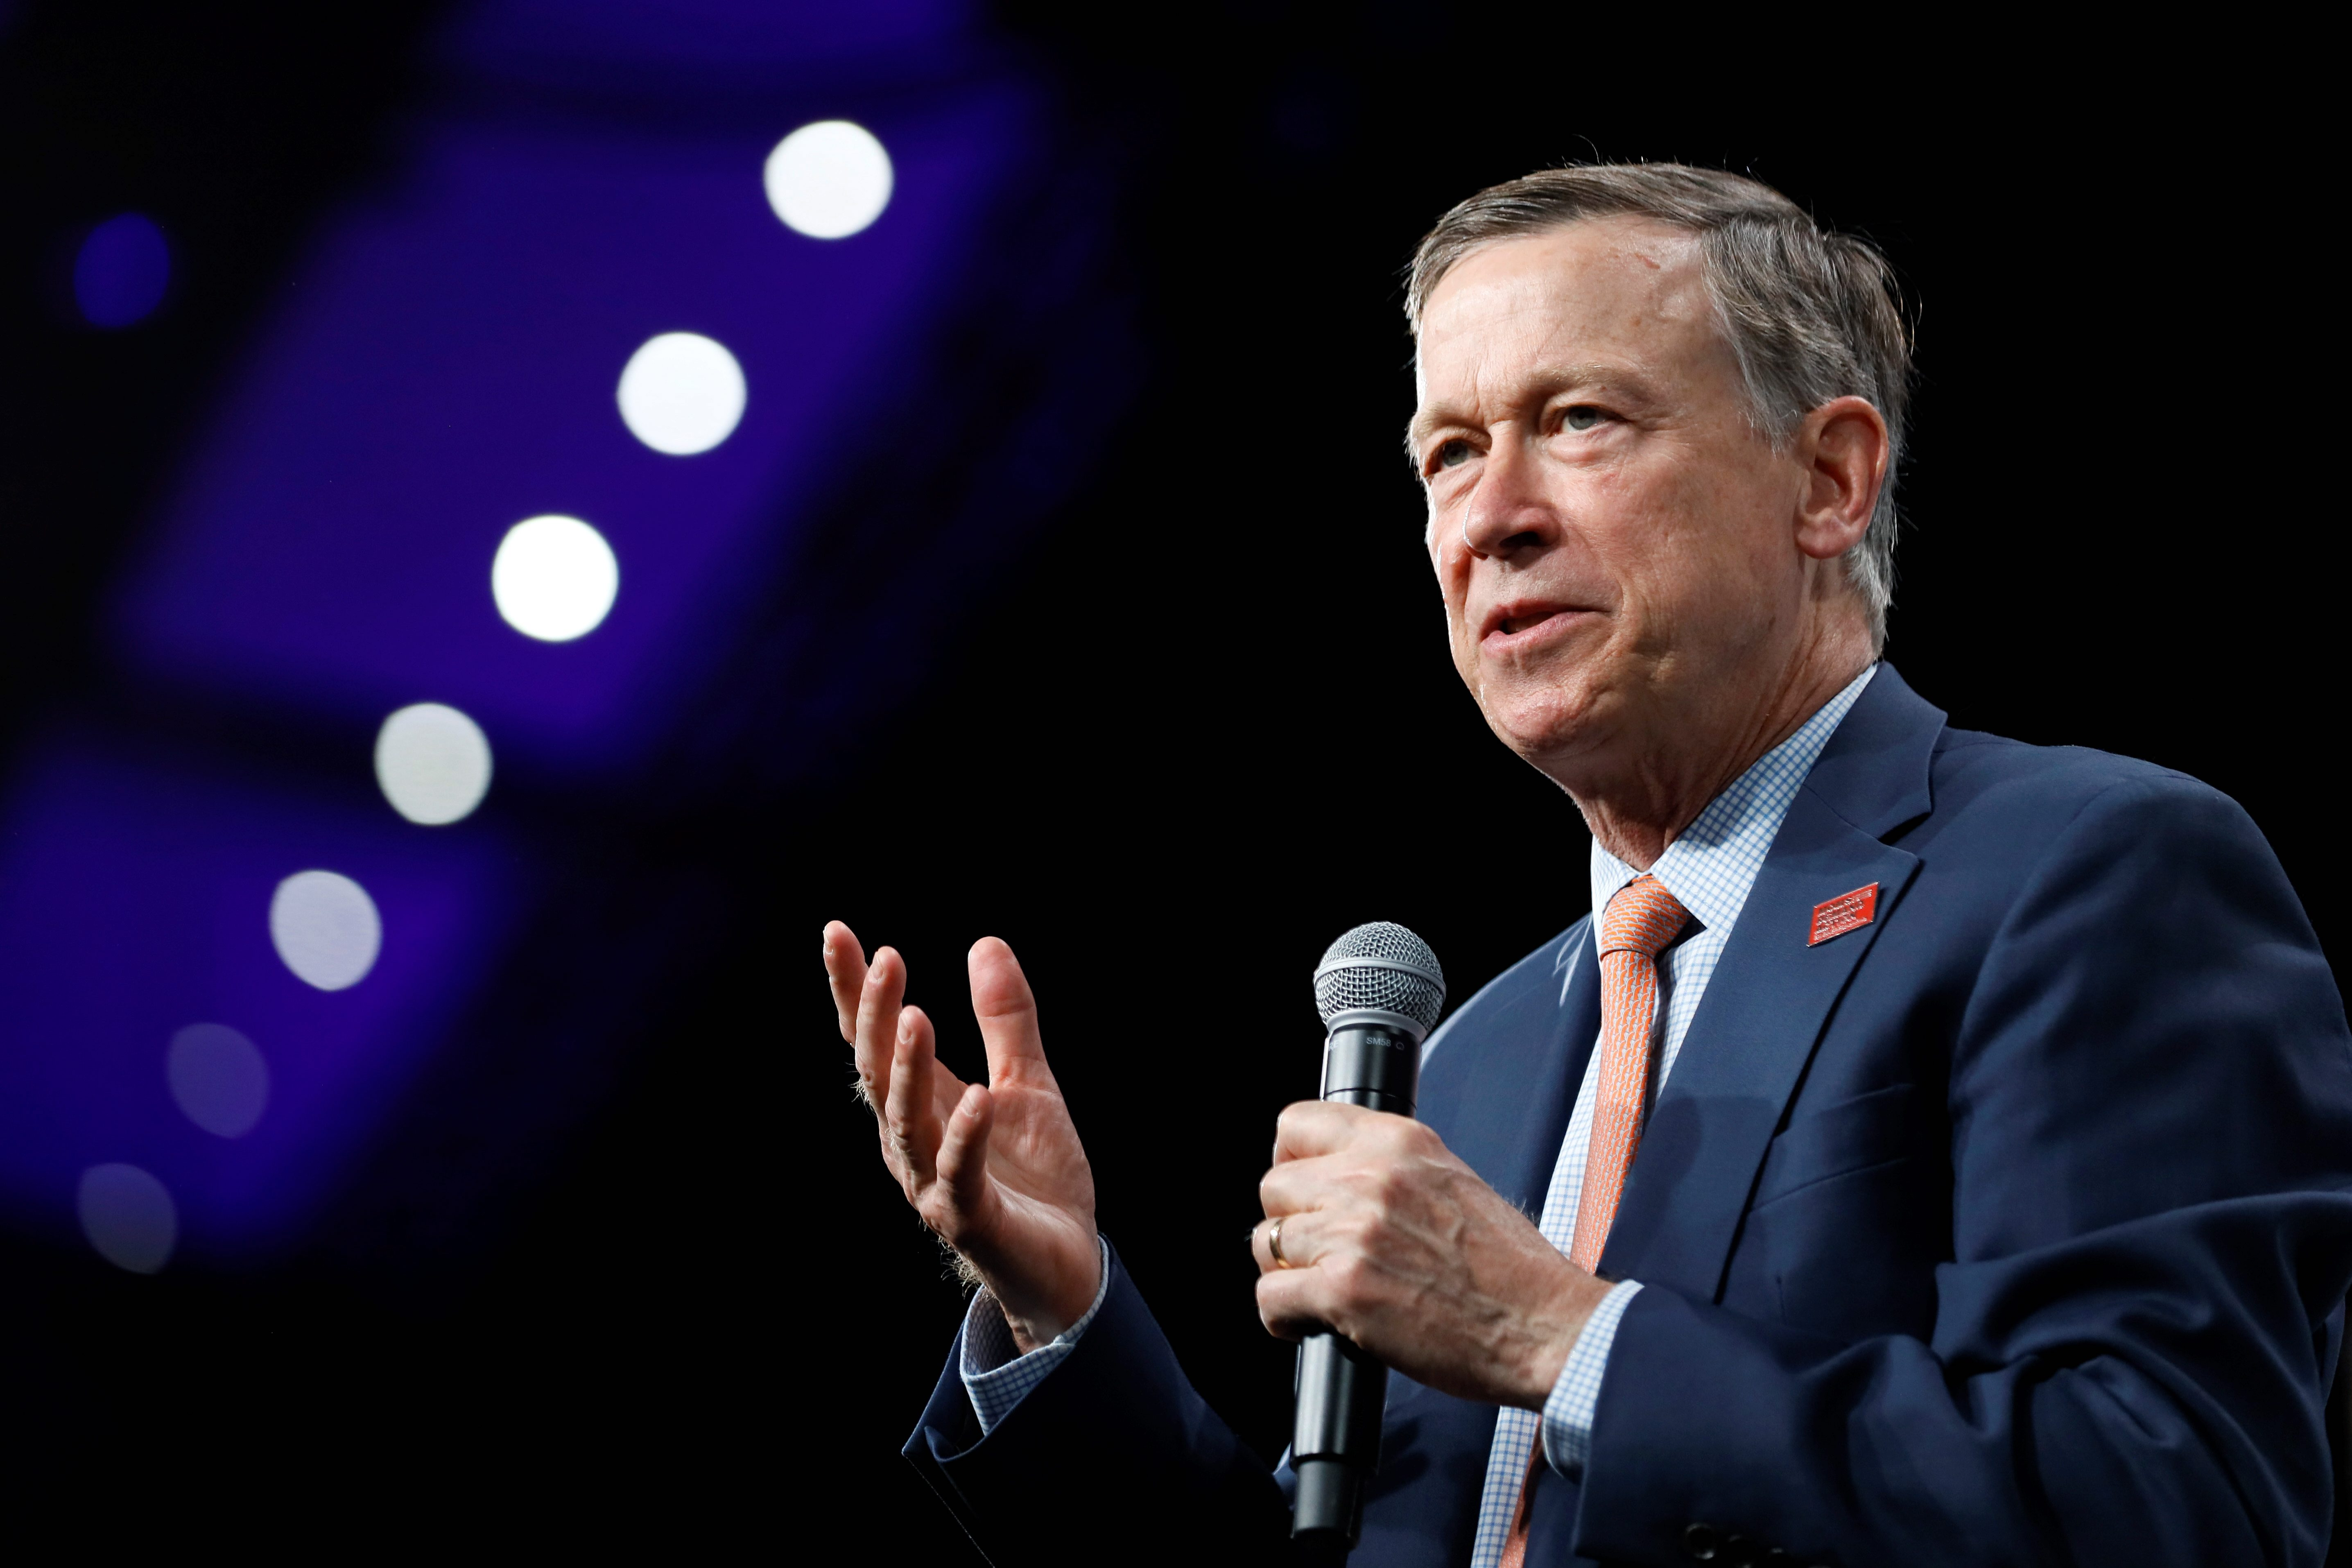 John Hickenlooper bid for Senate snubbed by progressive activists in favor of Andrew Romanoff